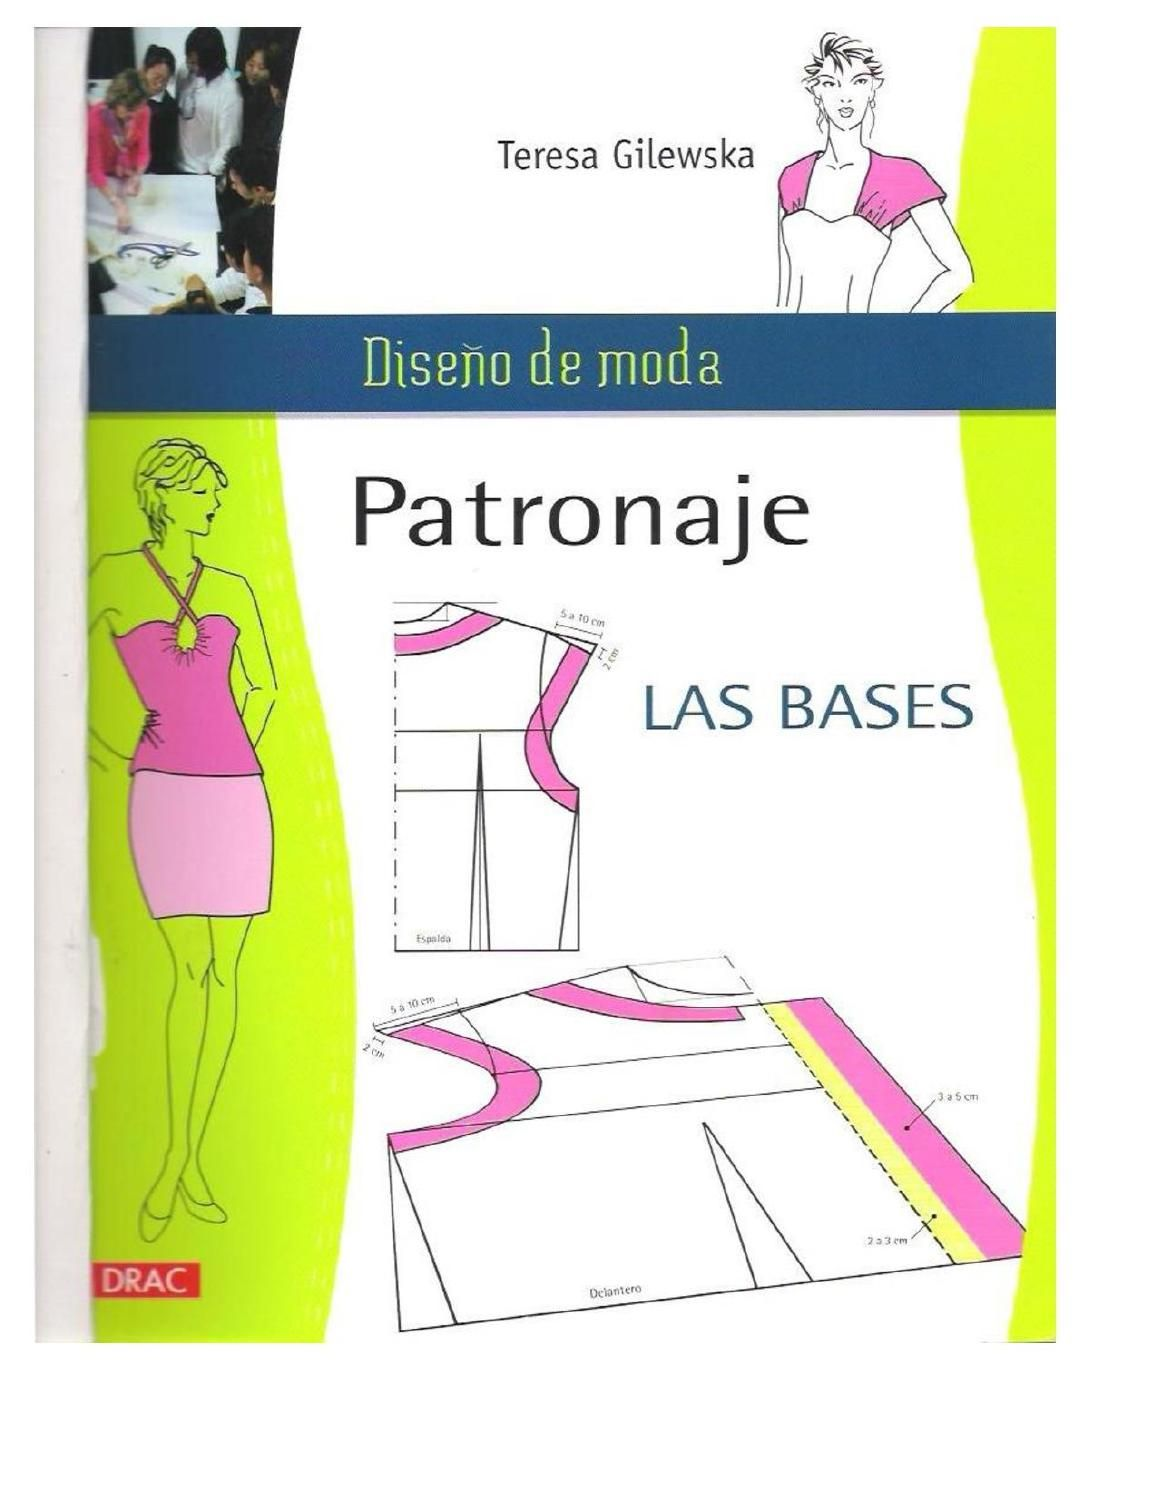 patronaje costura   patrones   Pinterest   Patronaje, Costura y Patrones